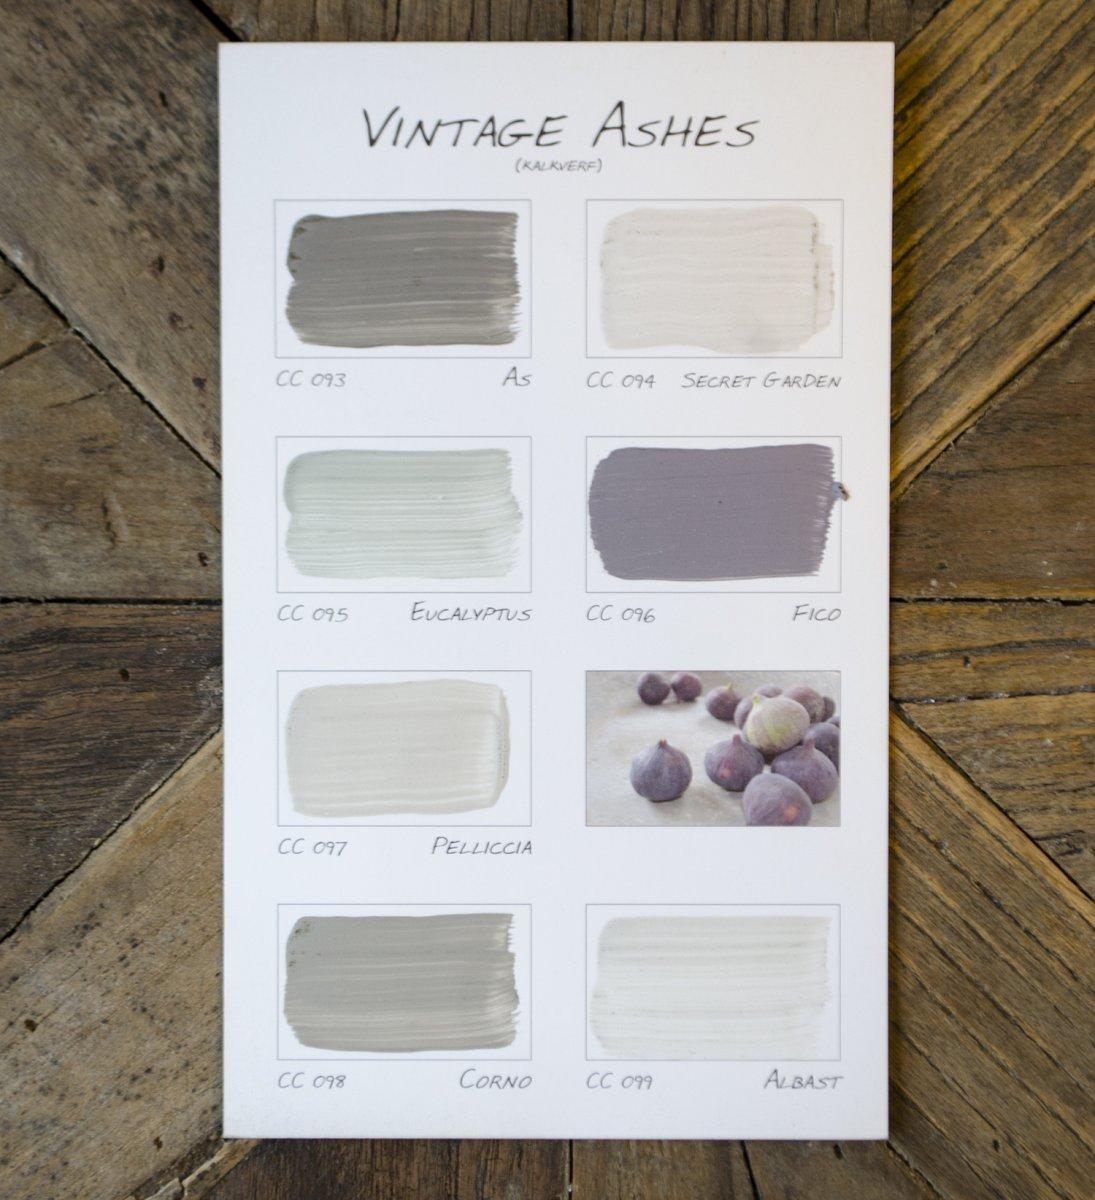 espeterhoeve carte colori kleurenkaart vintage ashes